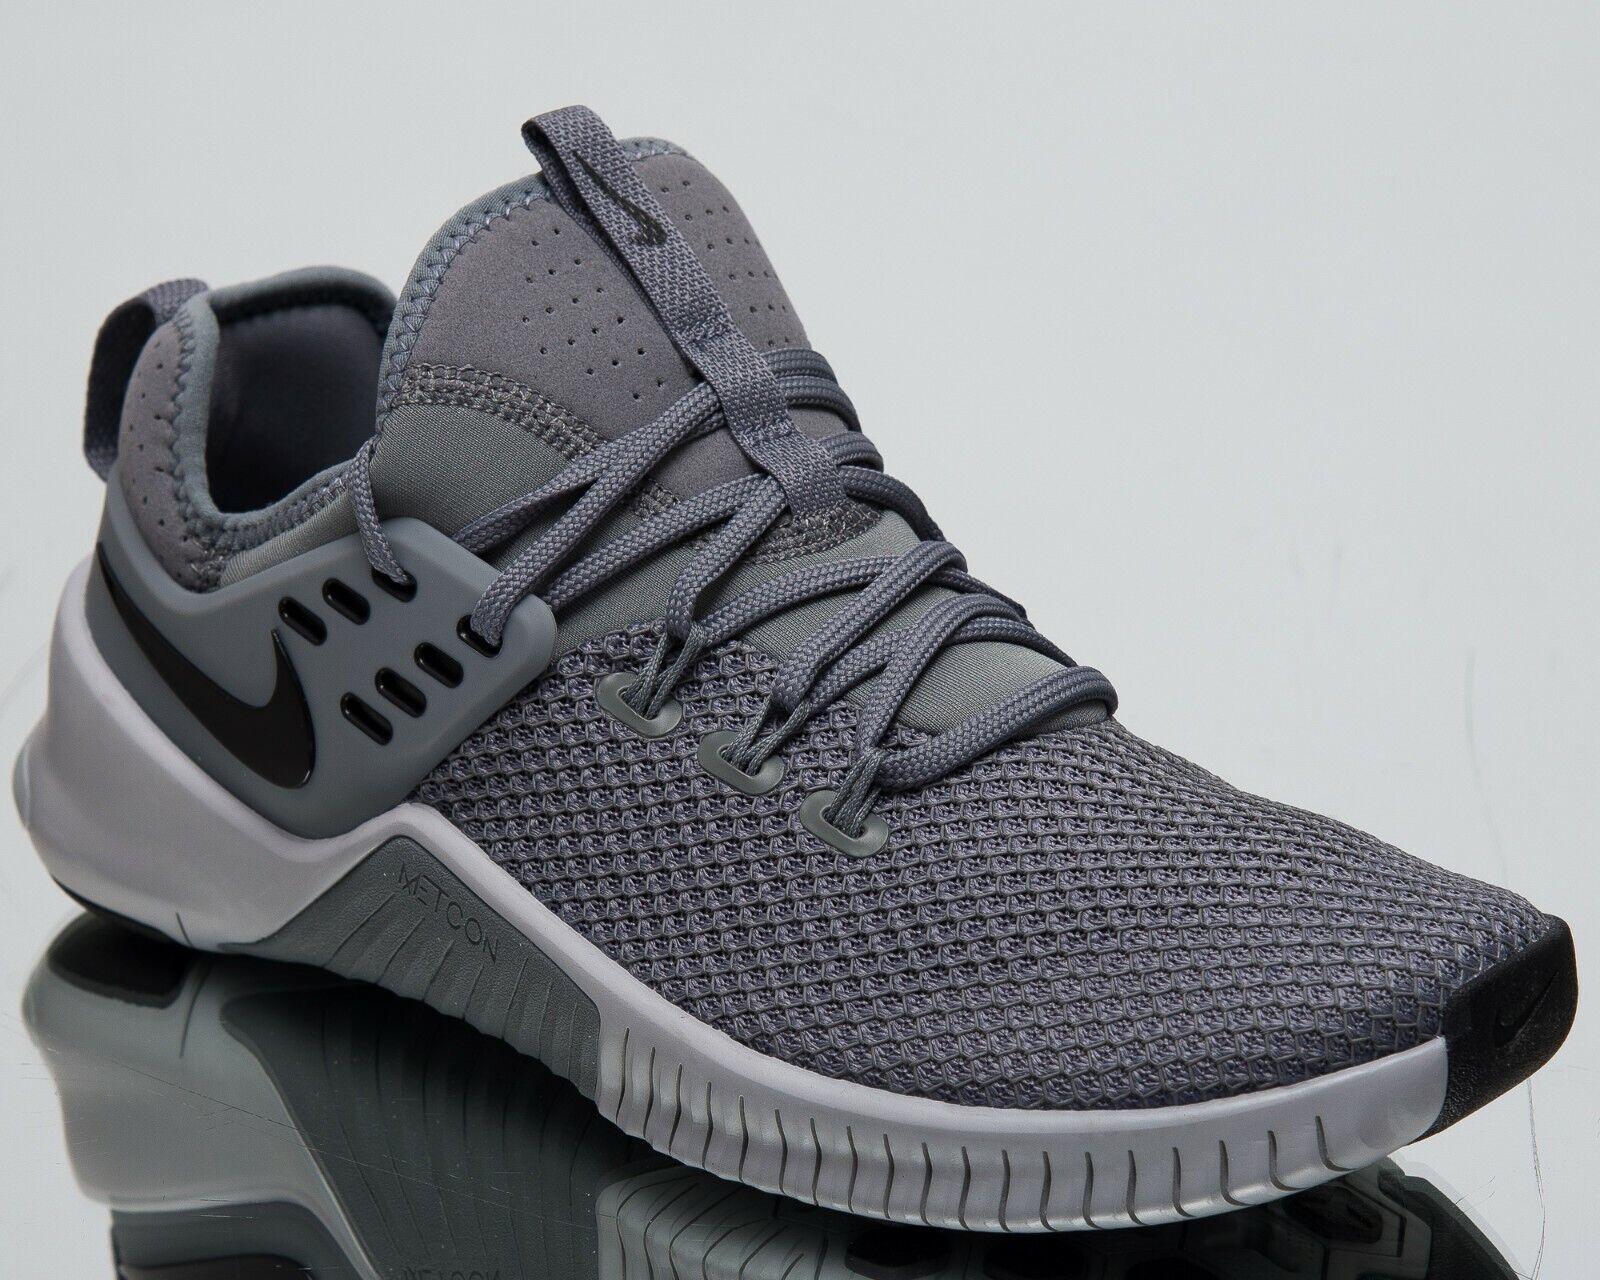 Nike Gratis X Metcon Neu Herren Turnschuhe Cool Grau Schwarz Turnschuhe AH8141-006      Deutschland Outlet